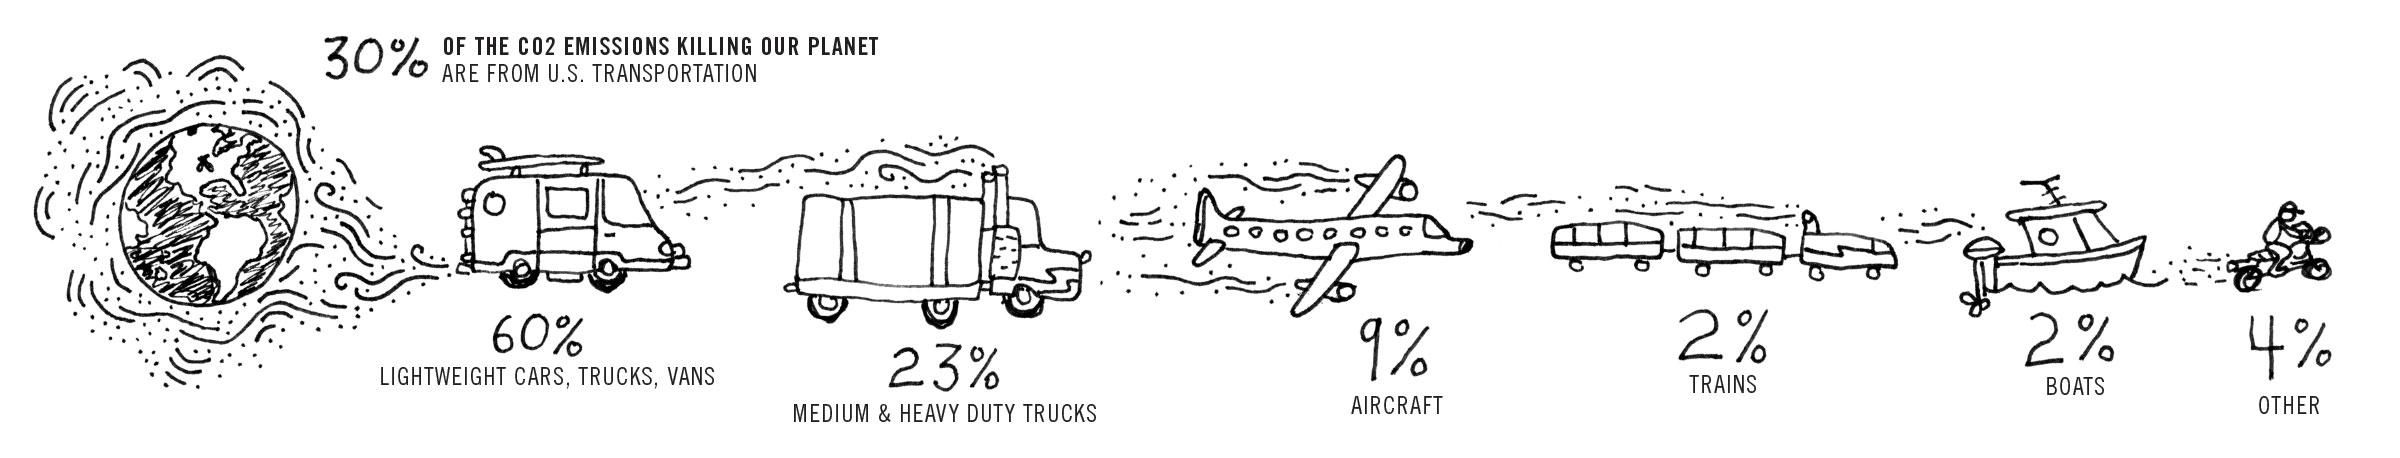 (Info Source: EPA,  Fast Facts: U.S. Transportation Sector GHG Emissions .  5 pp, 407 K, EPA-420-F-18-013, July 2018 )